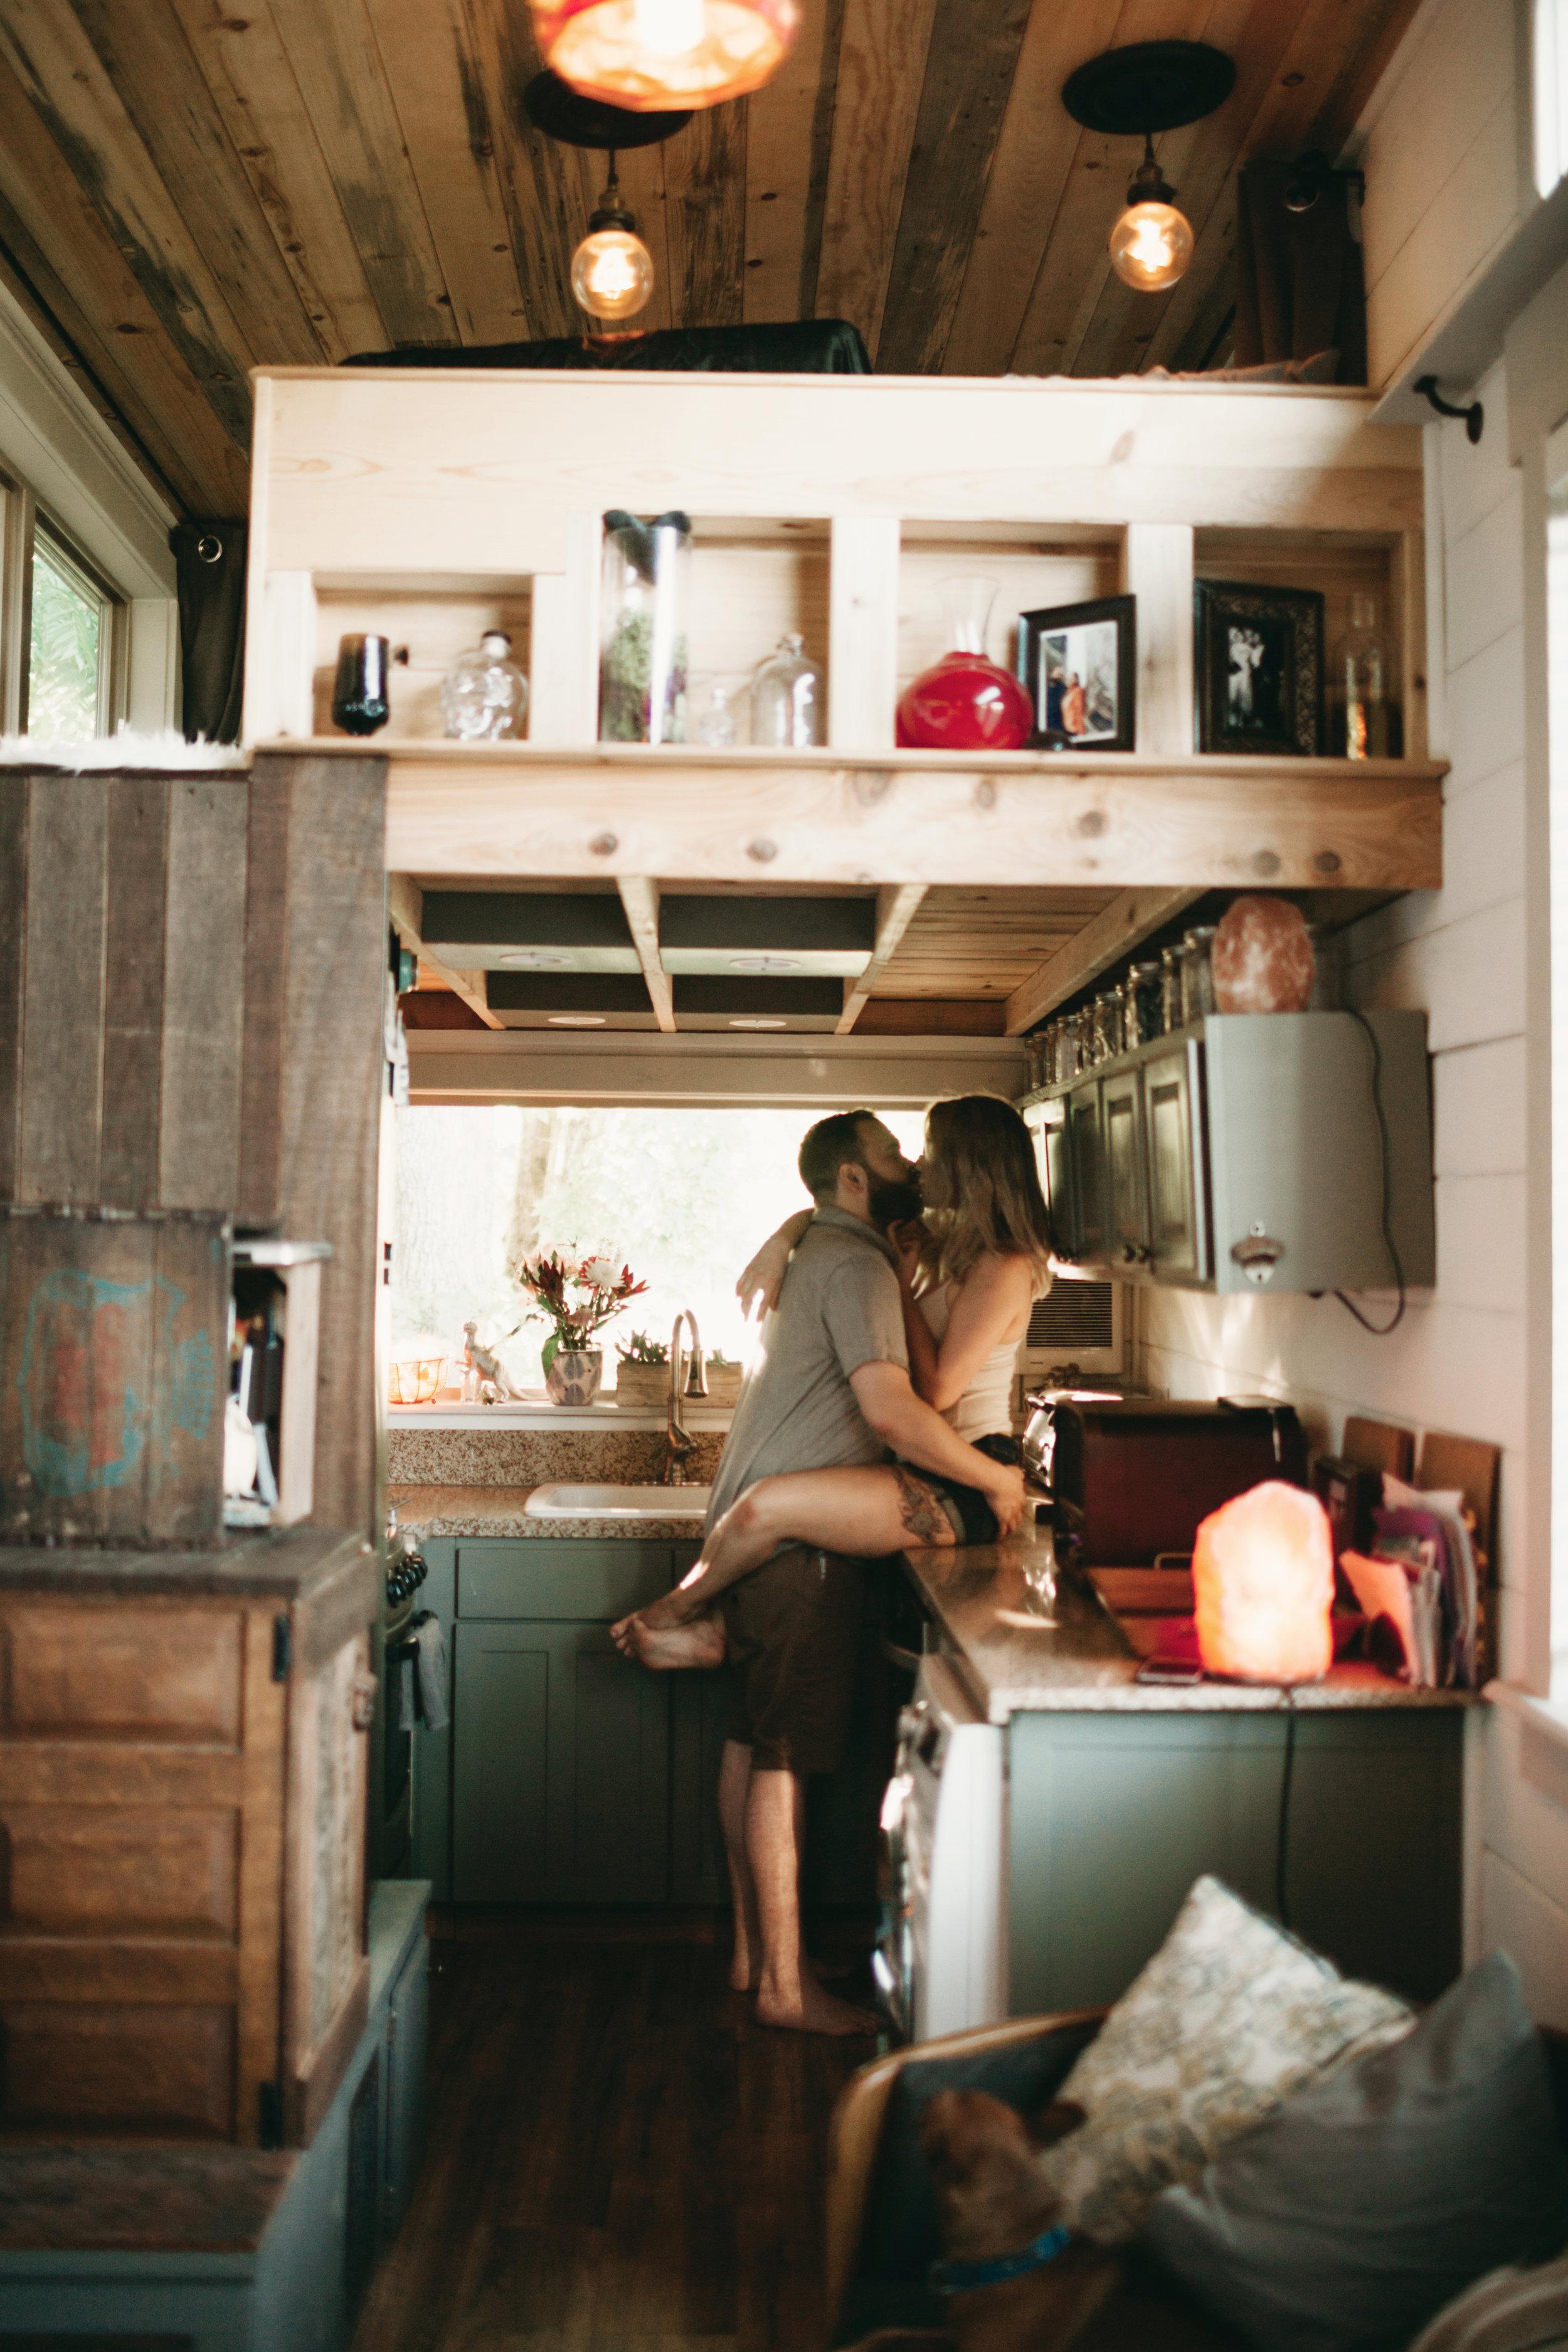 PORTLAND TINY HOME COUPLES PICS_JENNY CHOKBENGBOUN PHOTOS_-18 copy.jpg